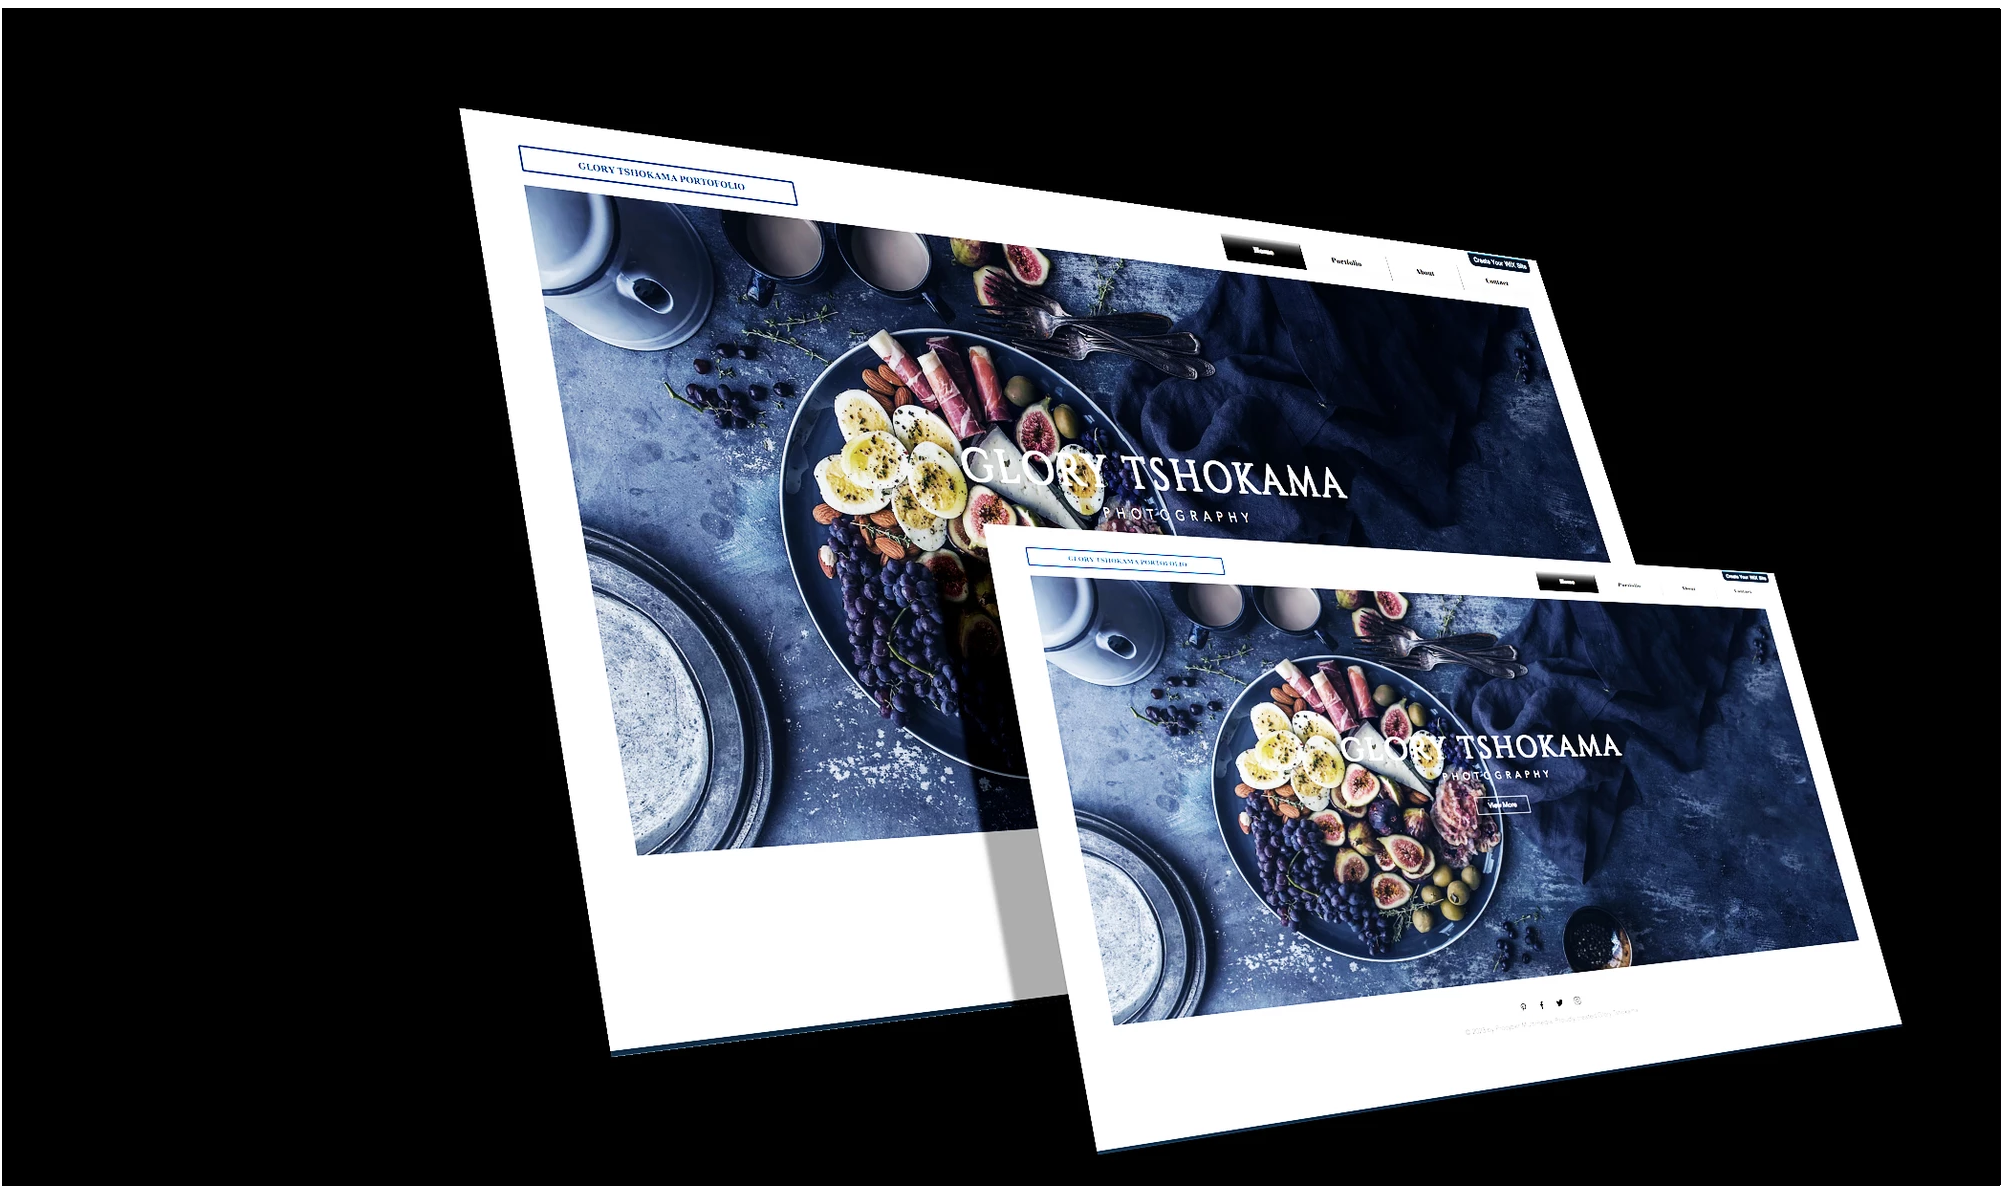 rankadvertiser.com image by Glory Tshokama